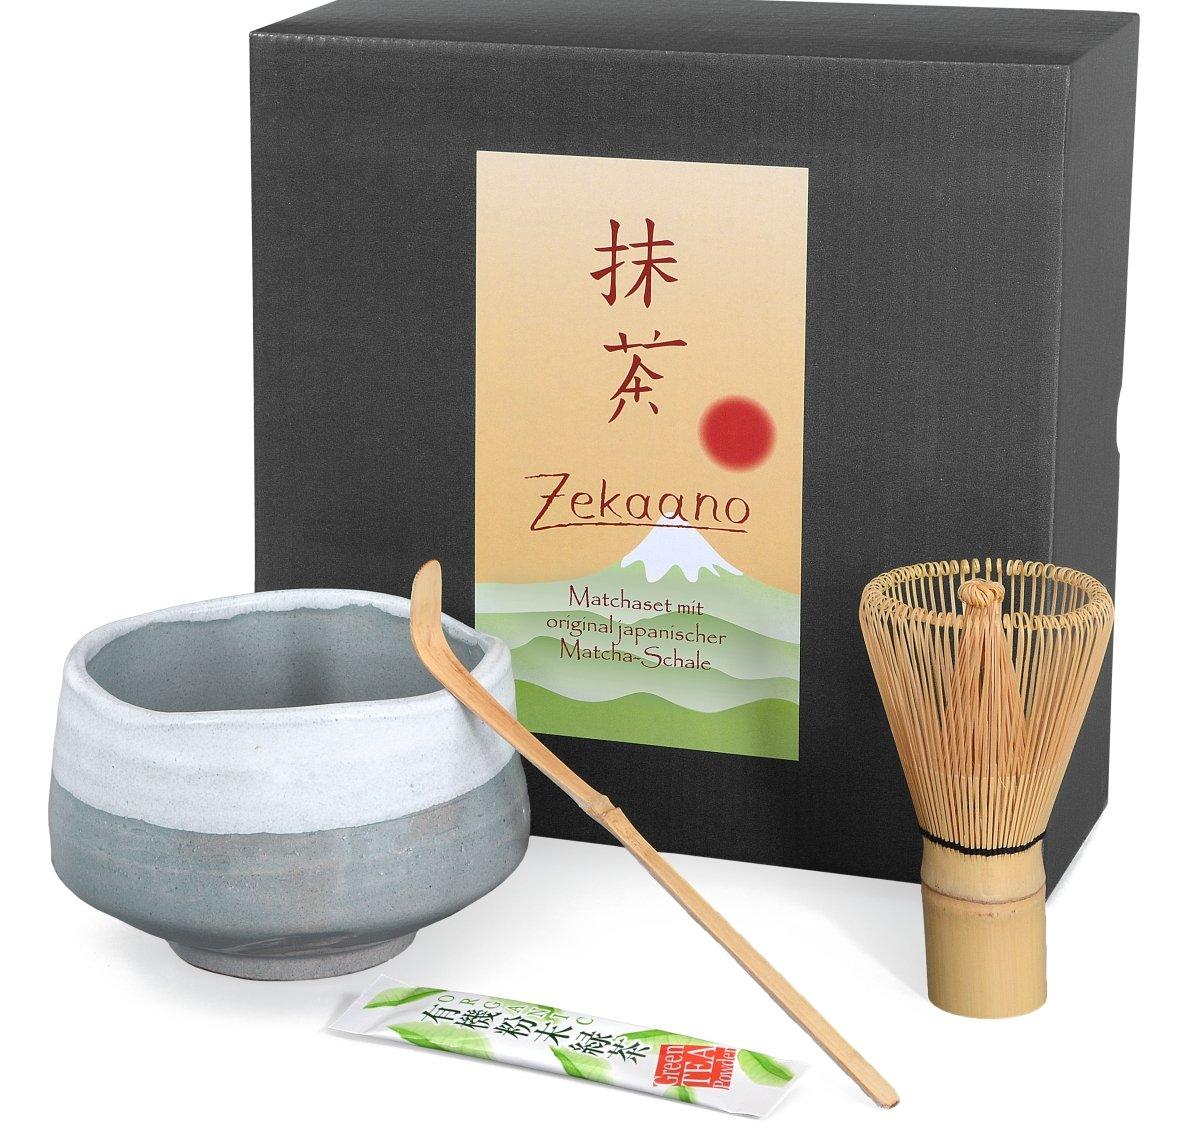 Aricola® 3 piece matcha set, consisting of handmade Japanese matcha bowl, 500 ml, Matcha bamboo spoon, Matcha bamboo whisk